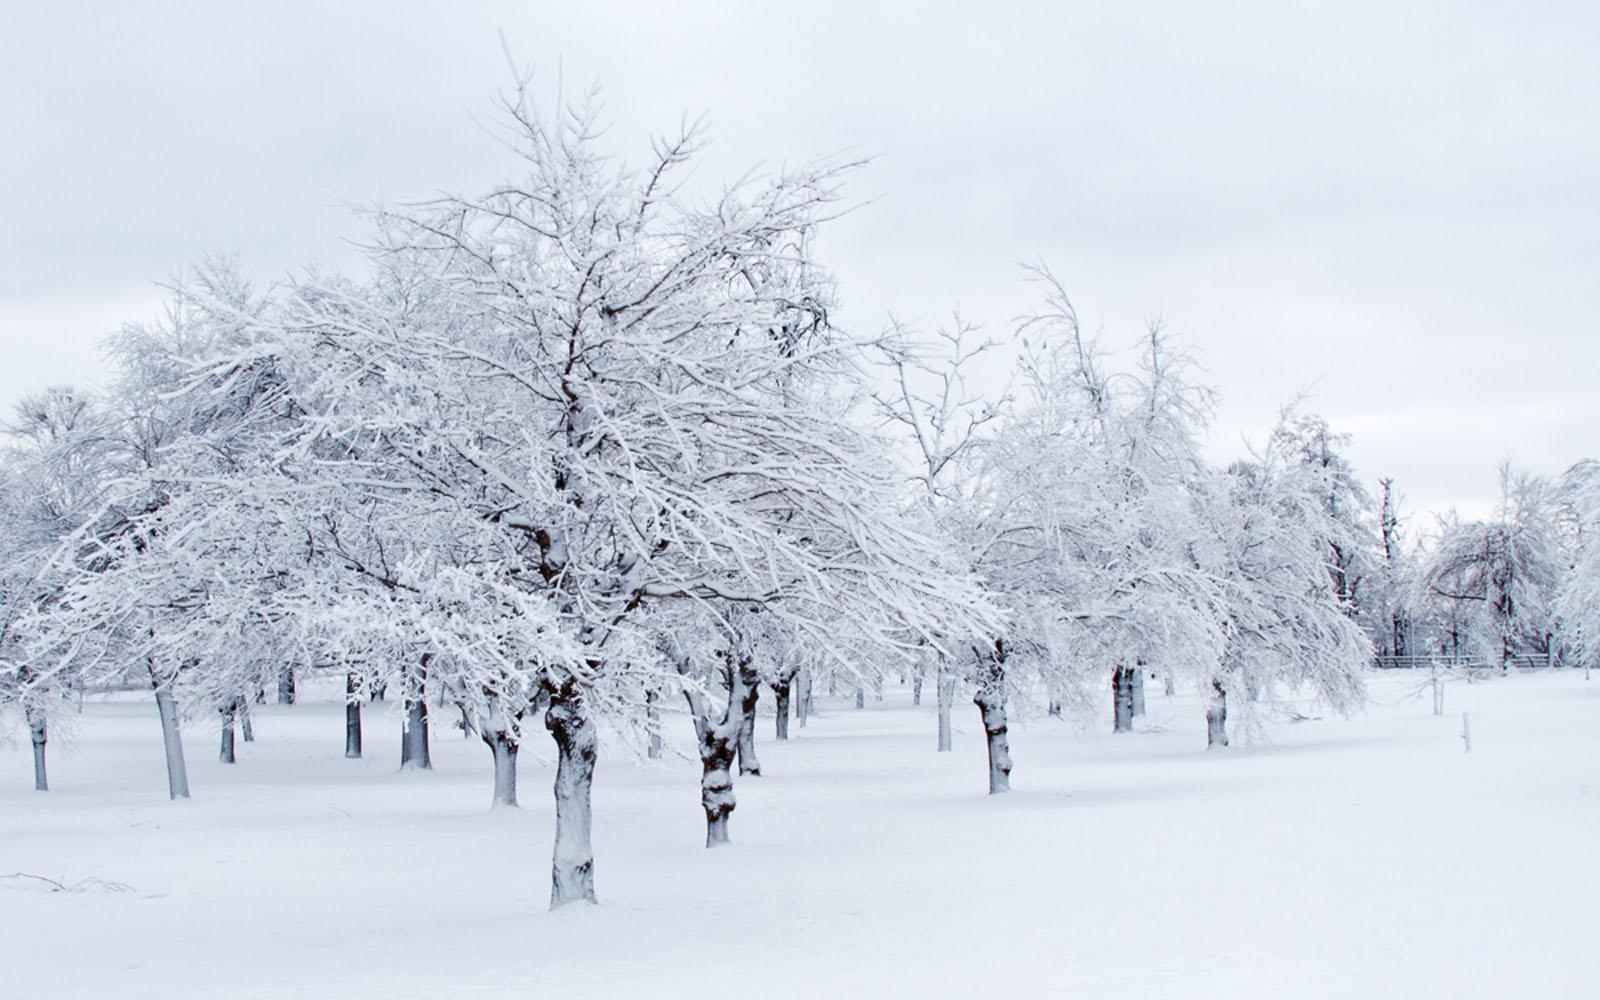 frozen trees widescreen wallpaper - photo #16